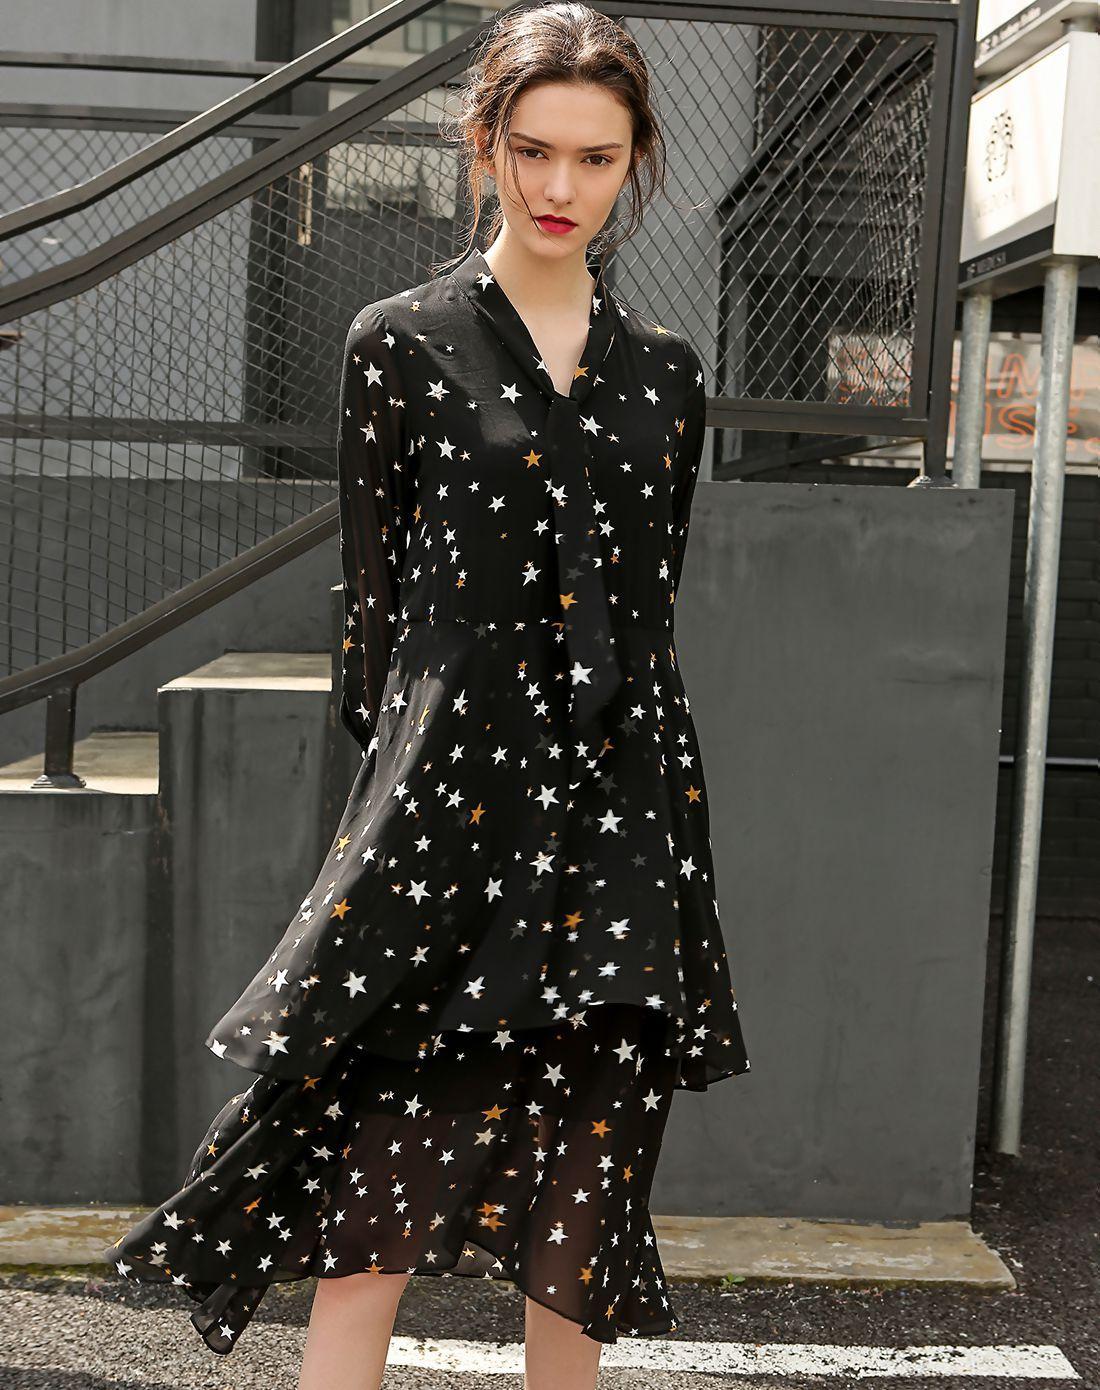 AdoreWe VIPme Swing DressesDesigner RINACN Black Floral V Neck